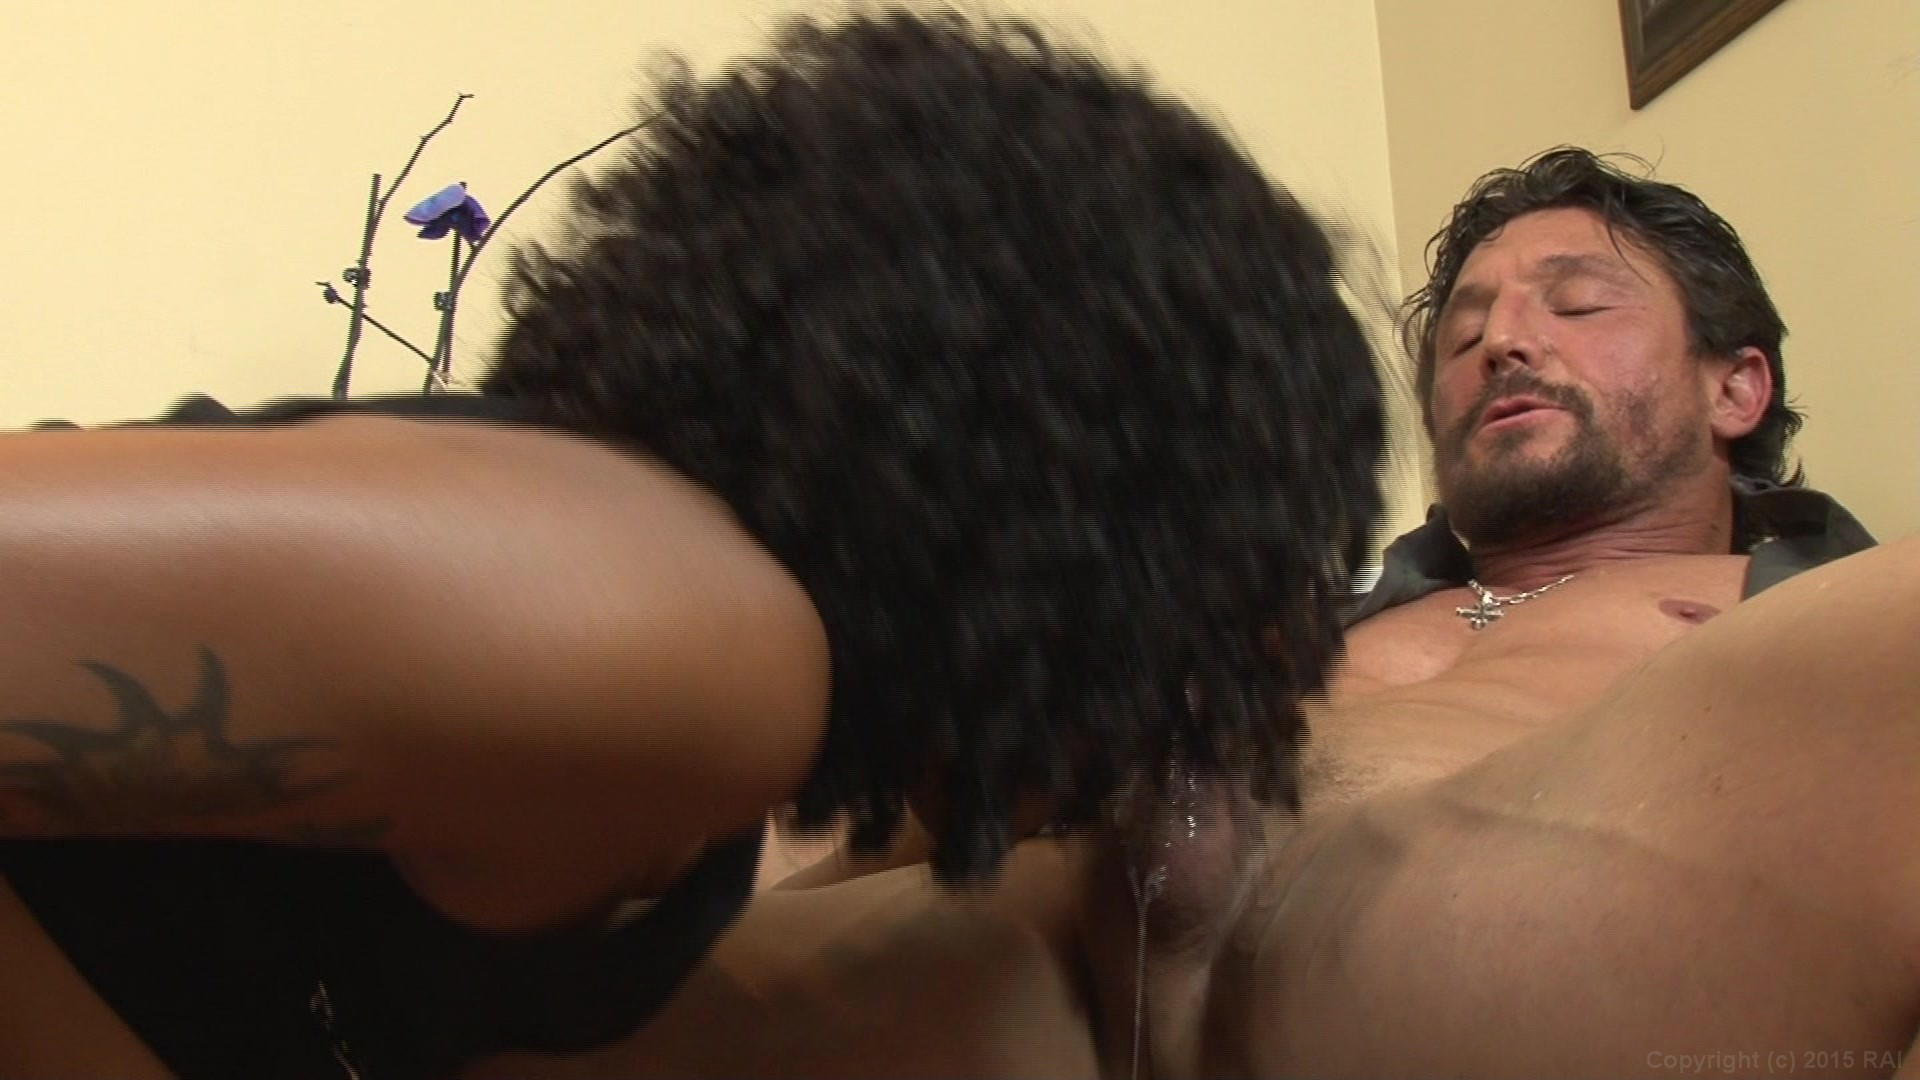 foreplay porno free video